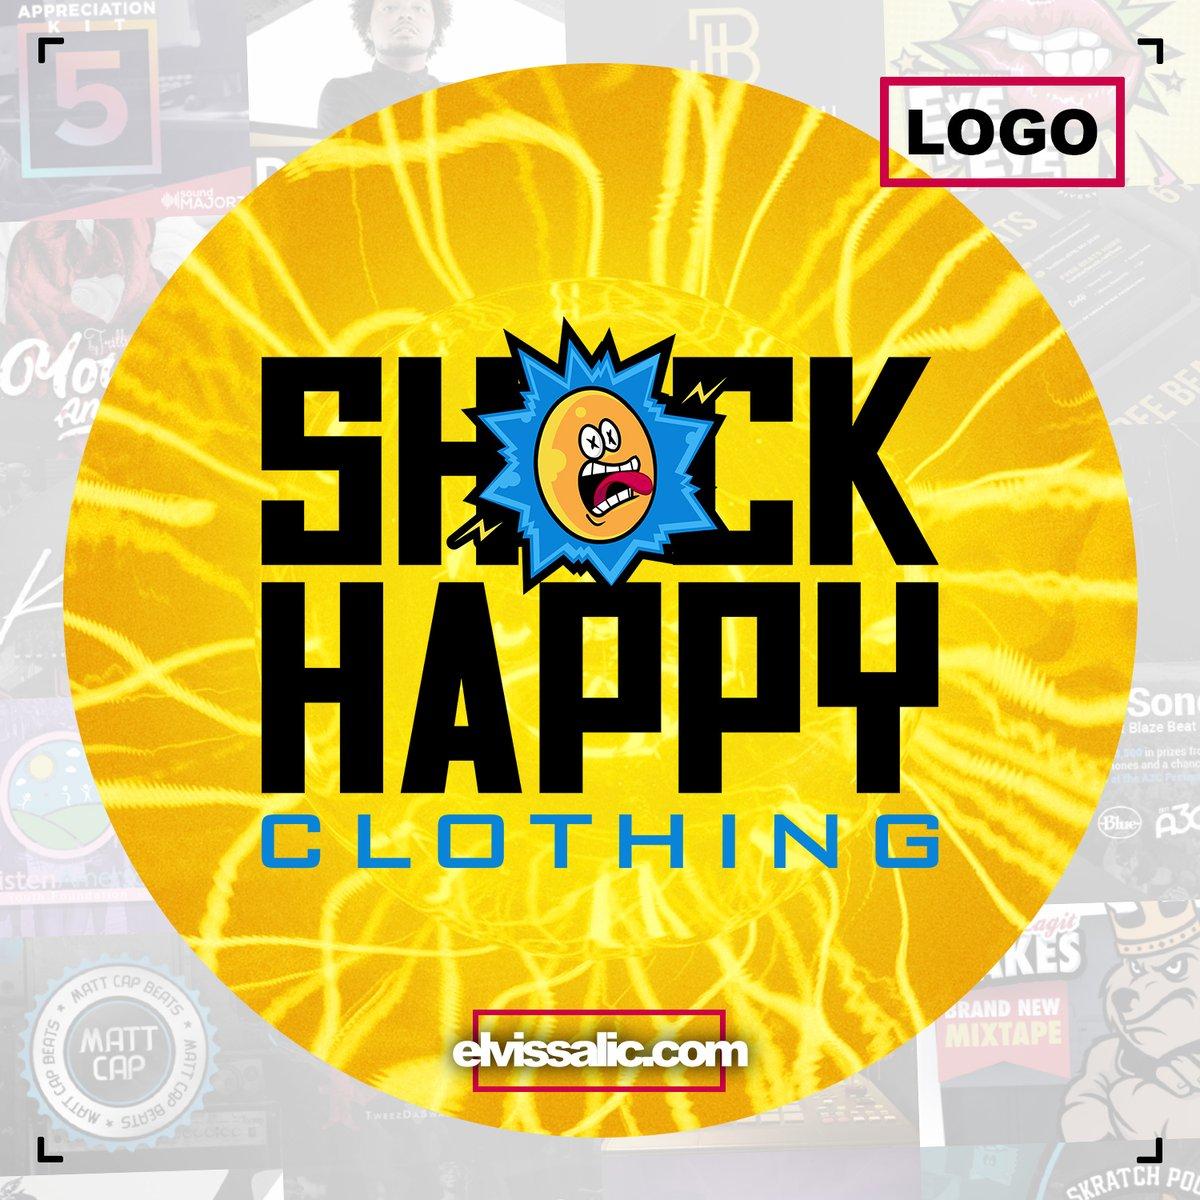 Logo development for Shock Happy Clothing  #graphic #design #graphicdesign #illustrator #vectordesign #brandingdesign #logooftheday #logoinspiration #logodesigner #logocreation #illustratordesign #designoftheday #mascot #logomascot #vectormascot https://t.co/88DslipSbX